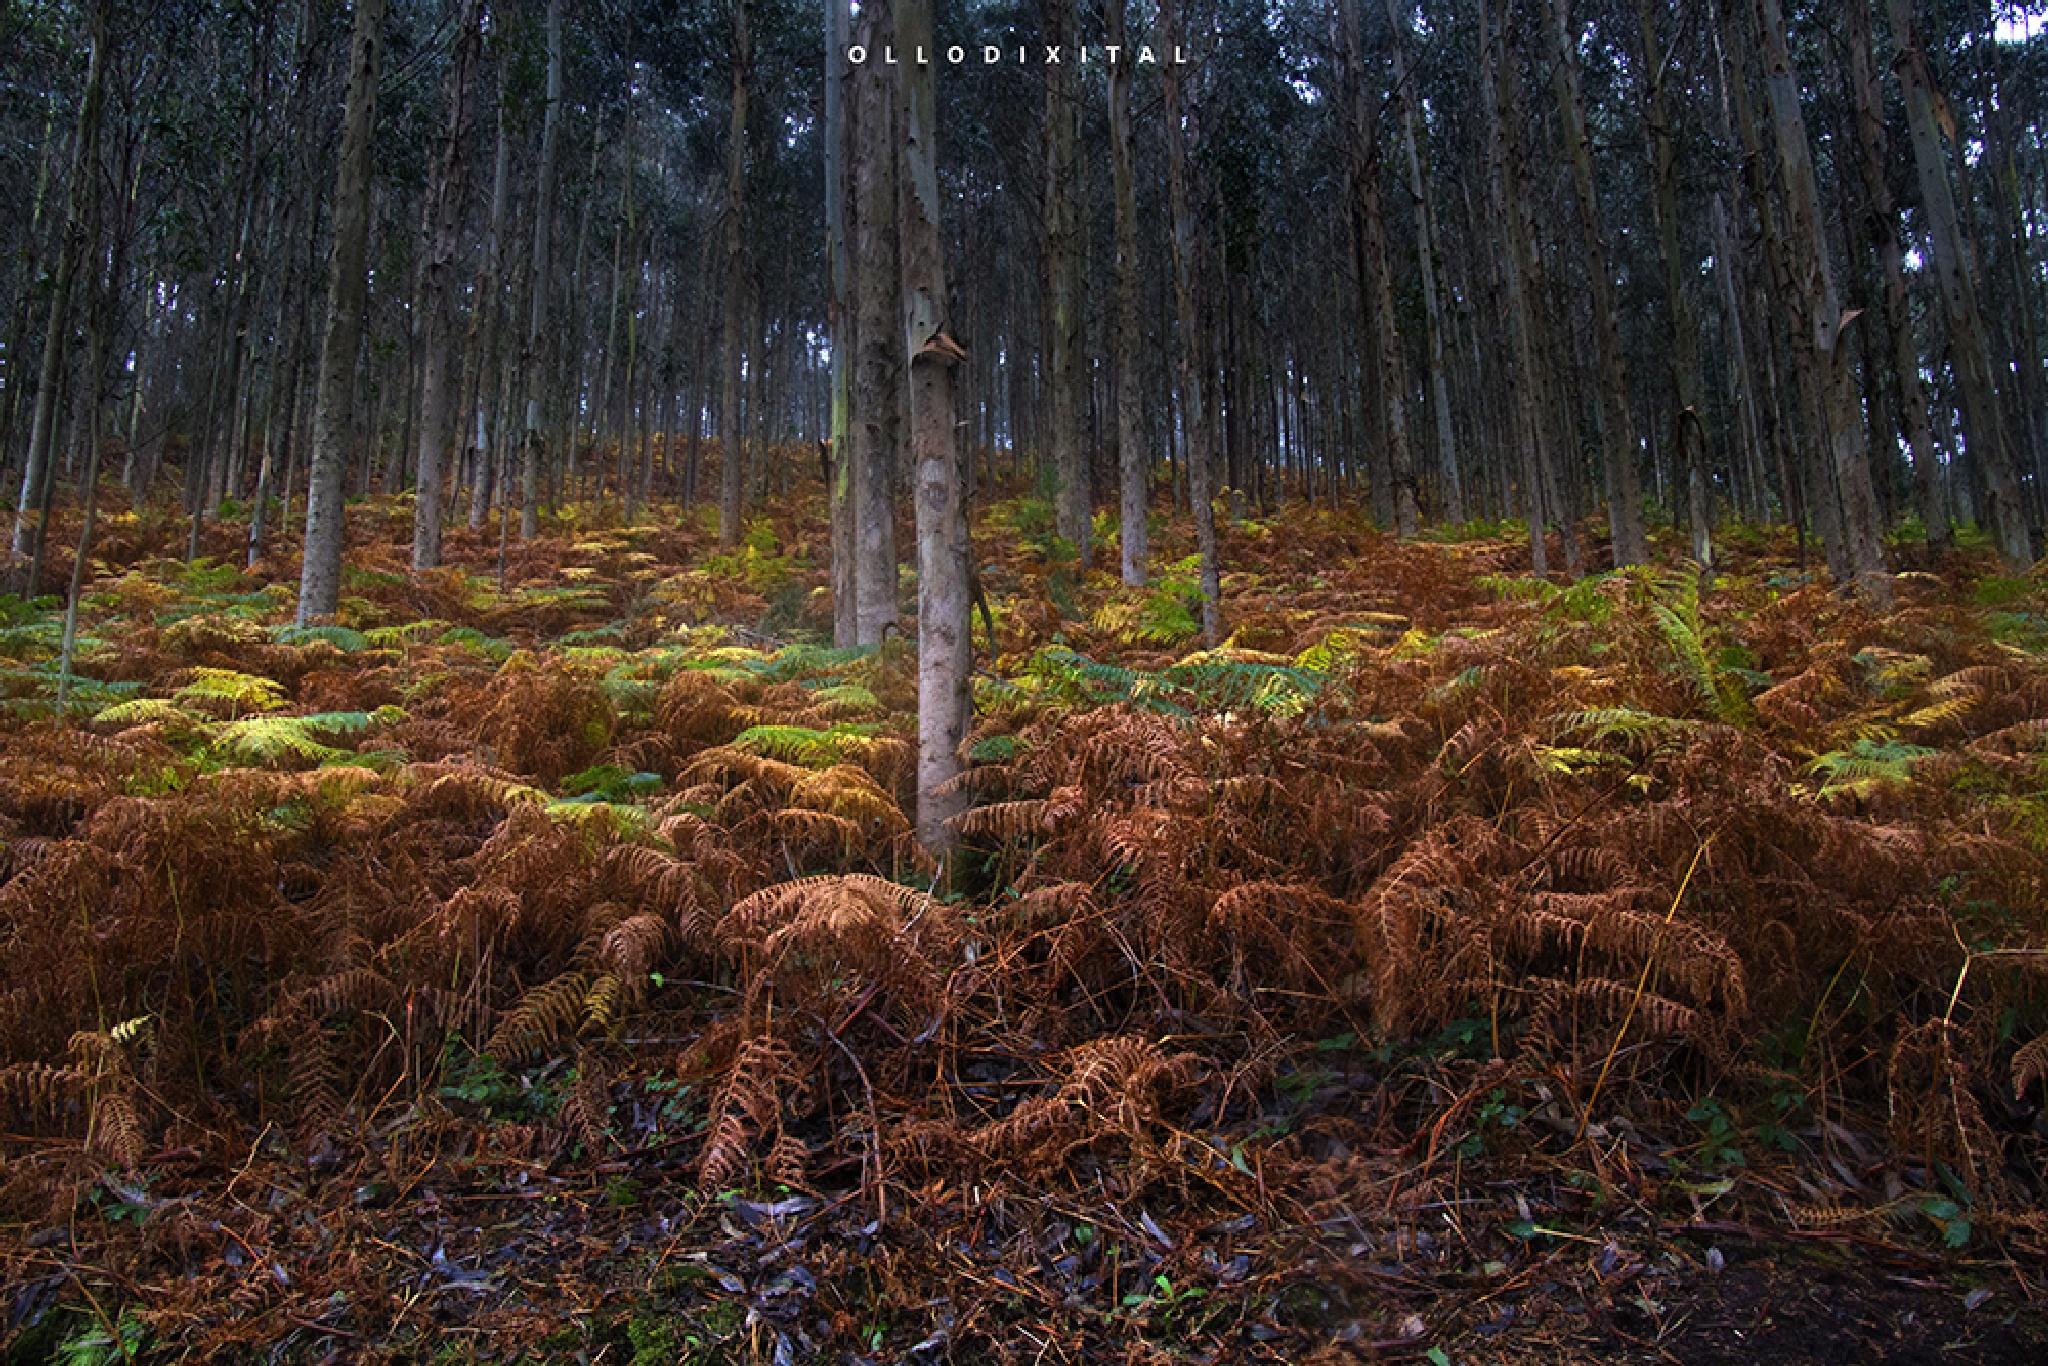 Autumn landscapes by OlloDixital